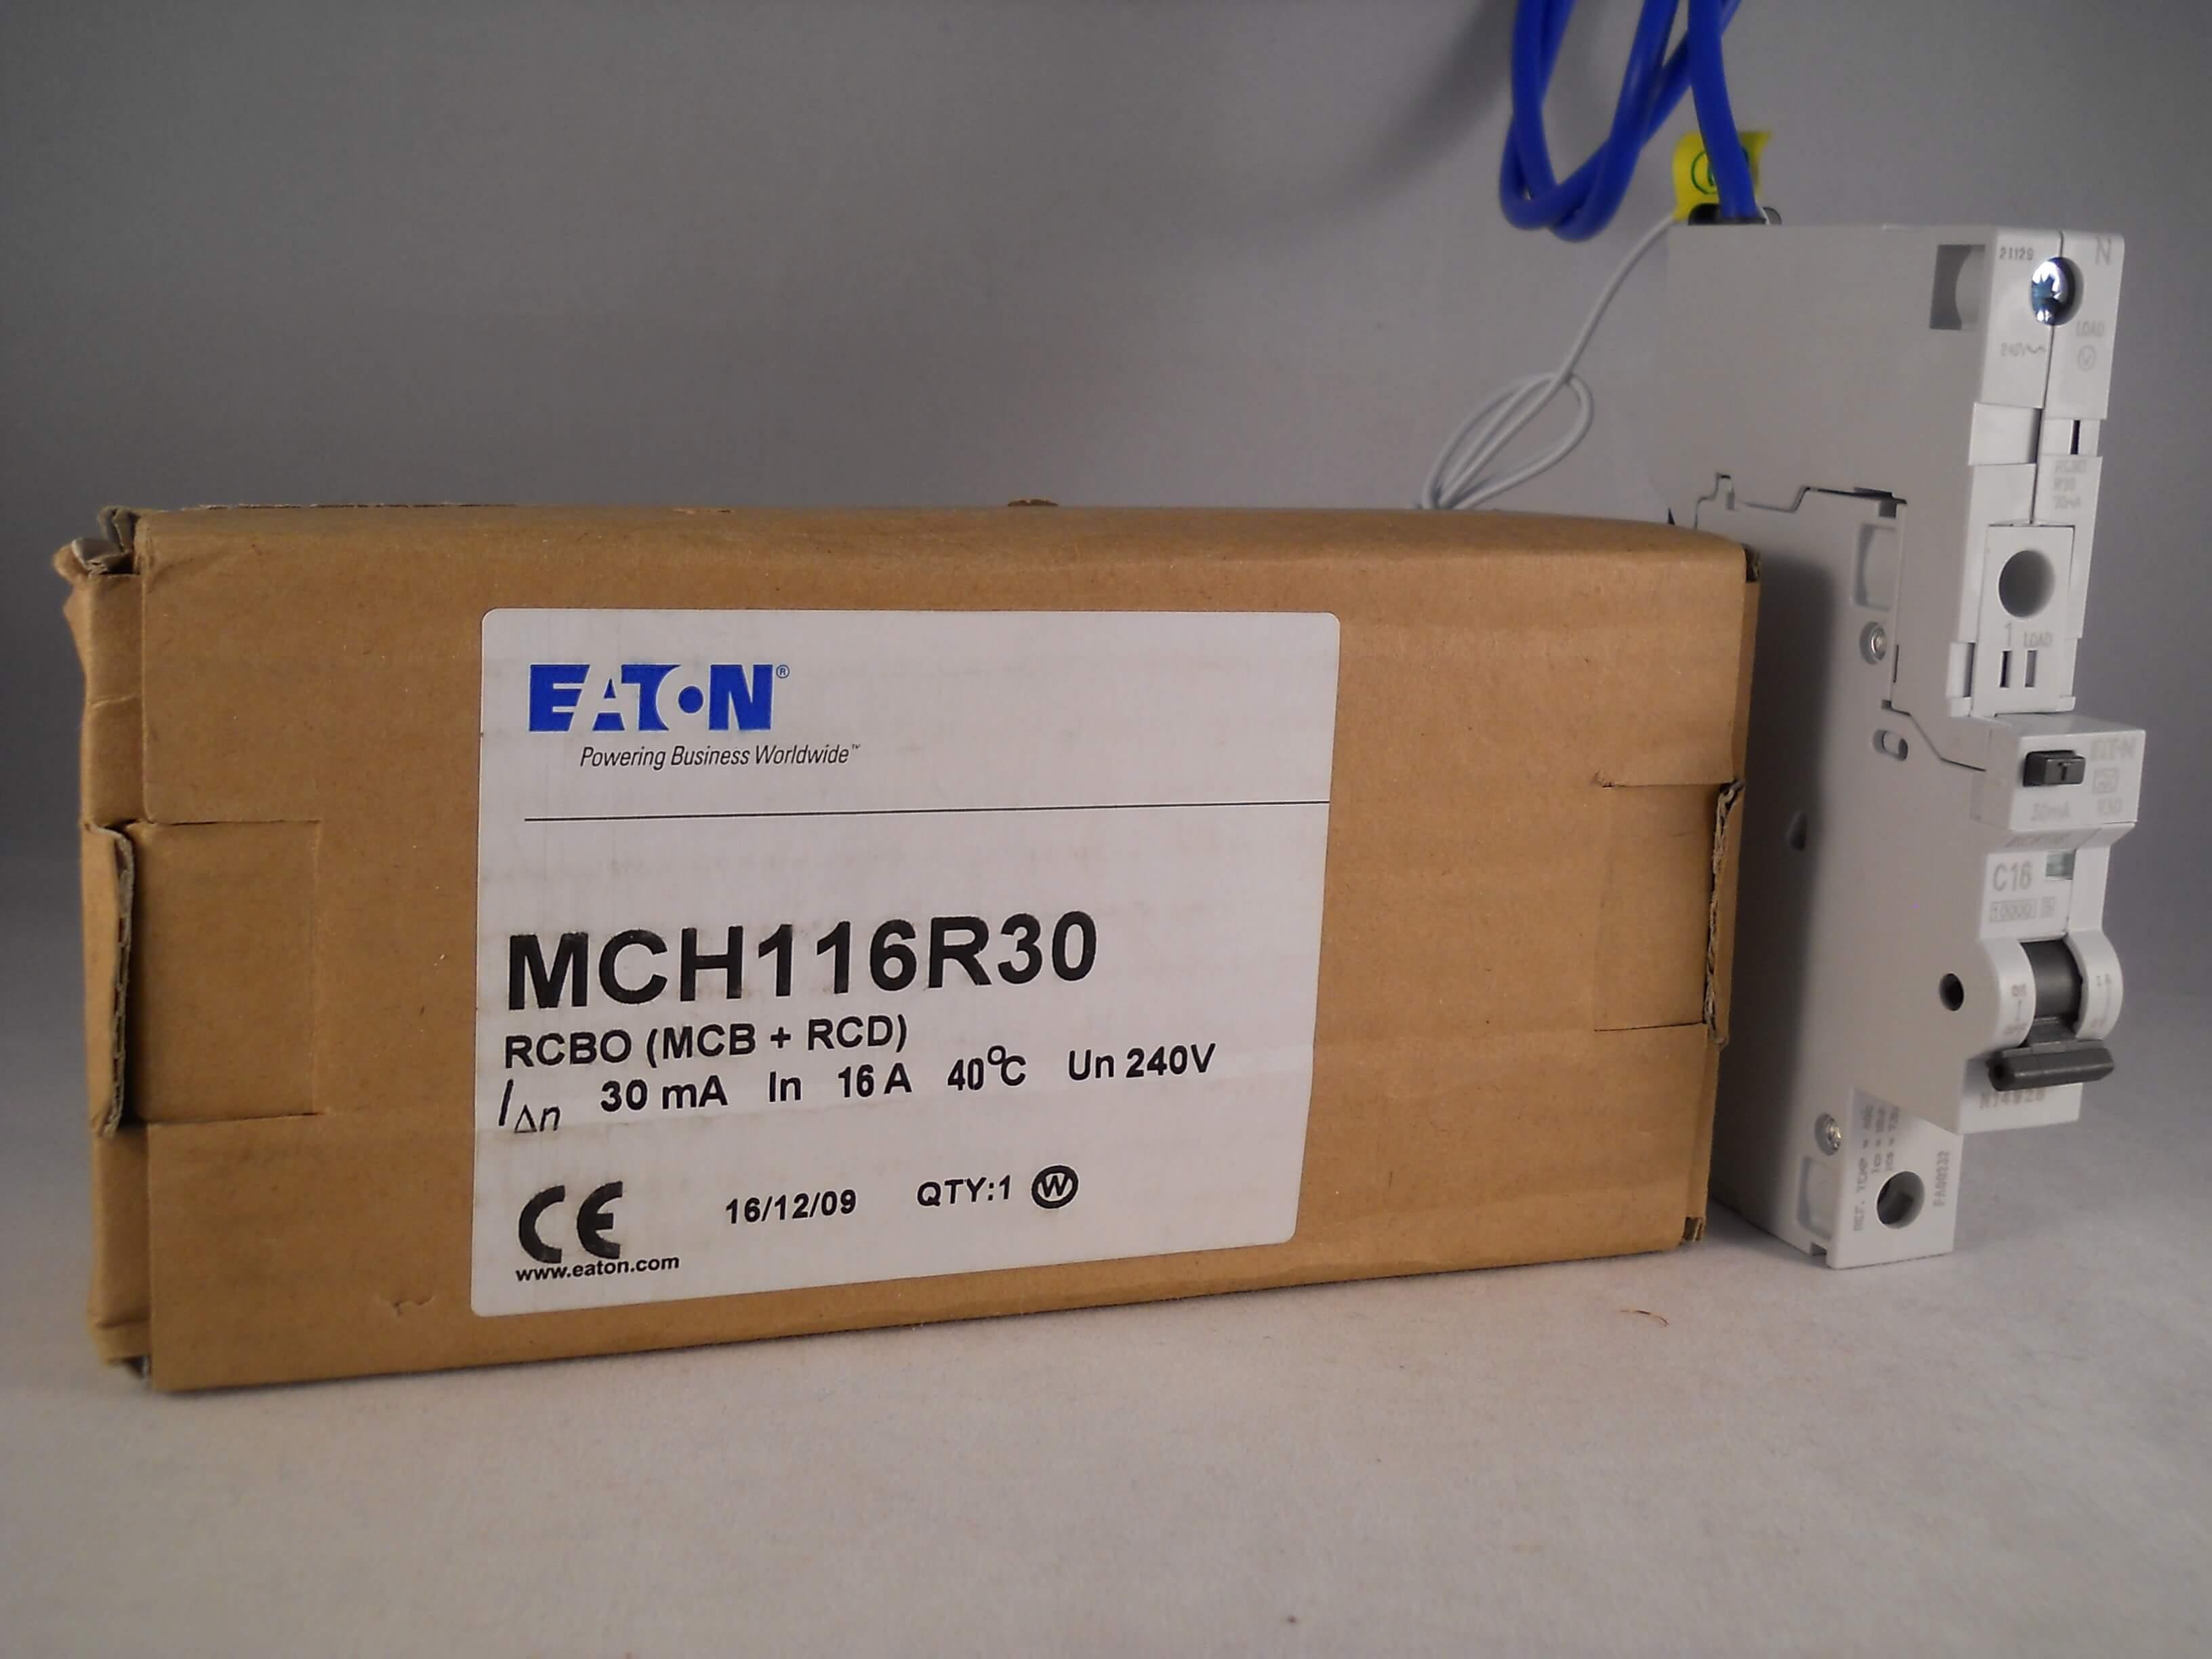 Phenomenal Mem Eaton Rcbo 16 Amp 30Ma Type C 16A Mr30 Pod Memshield 2 Memera Wiring Digital Resources Dadeaprontobusorg